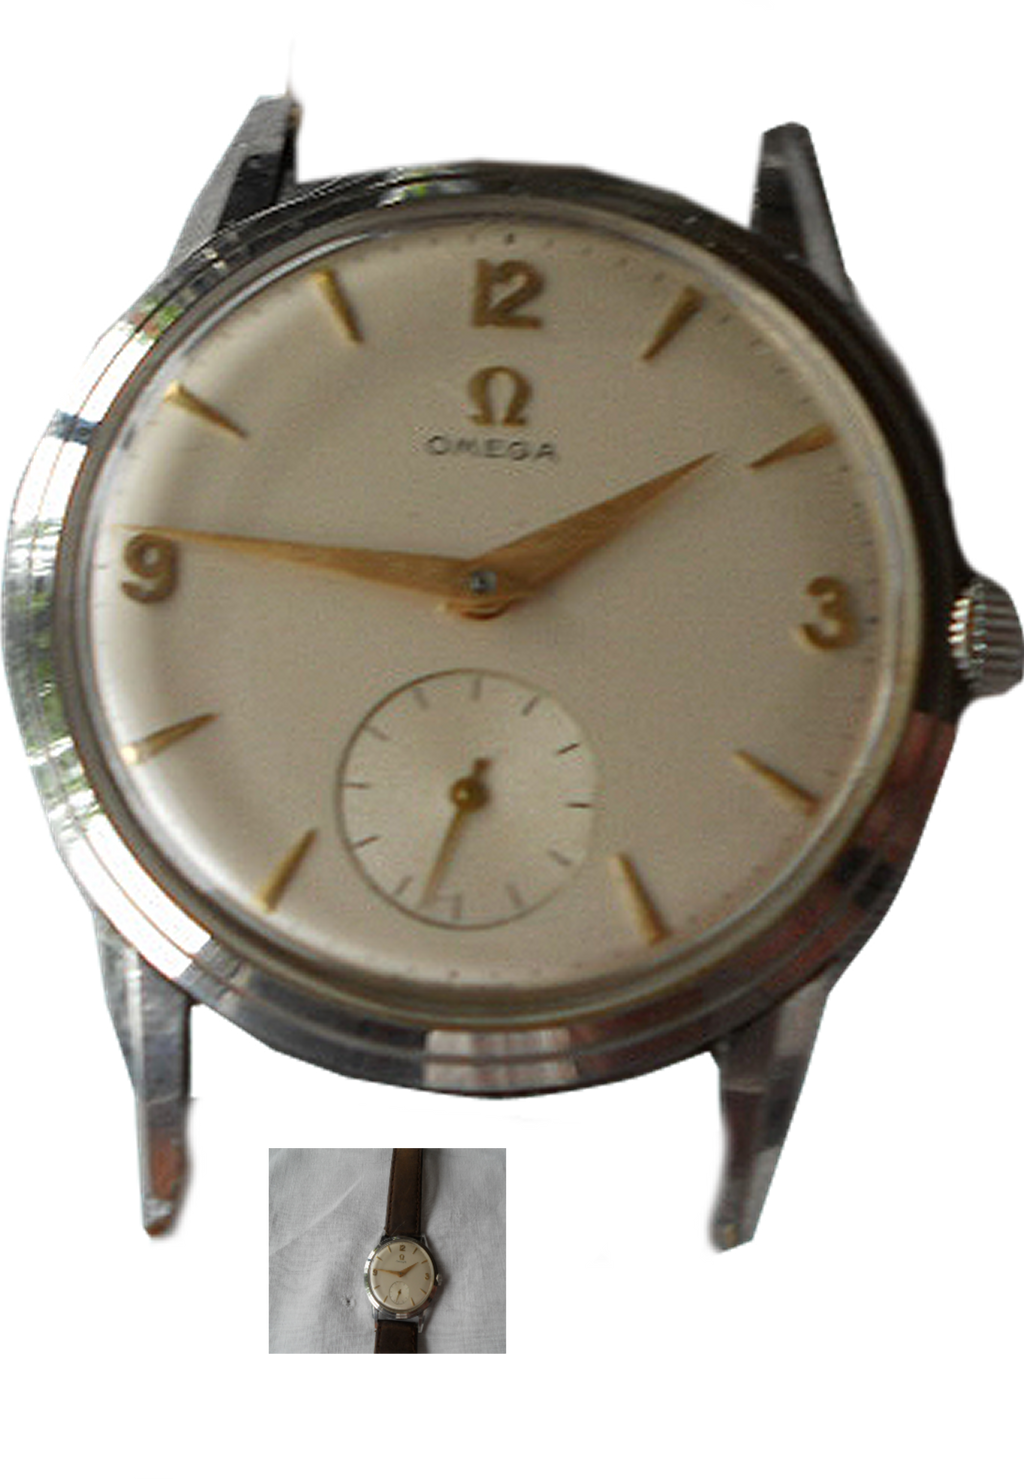 pin clock watch omega - photo #1